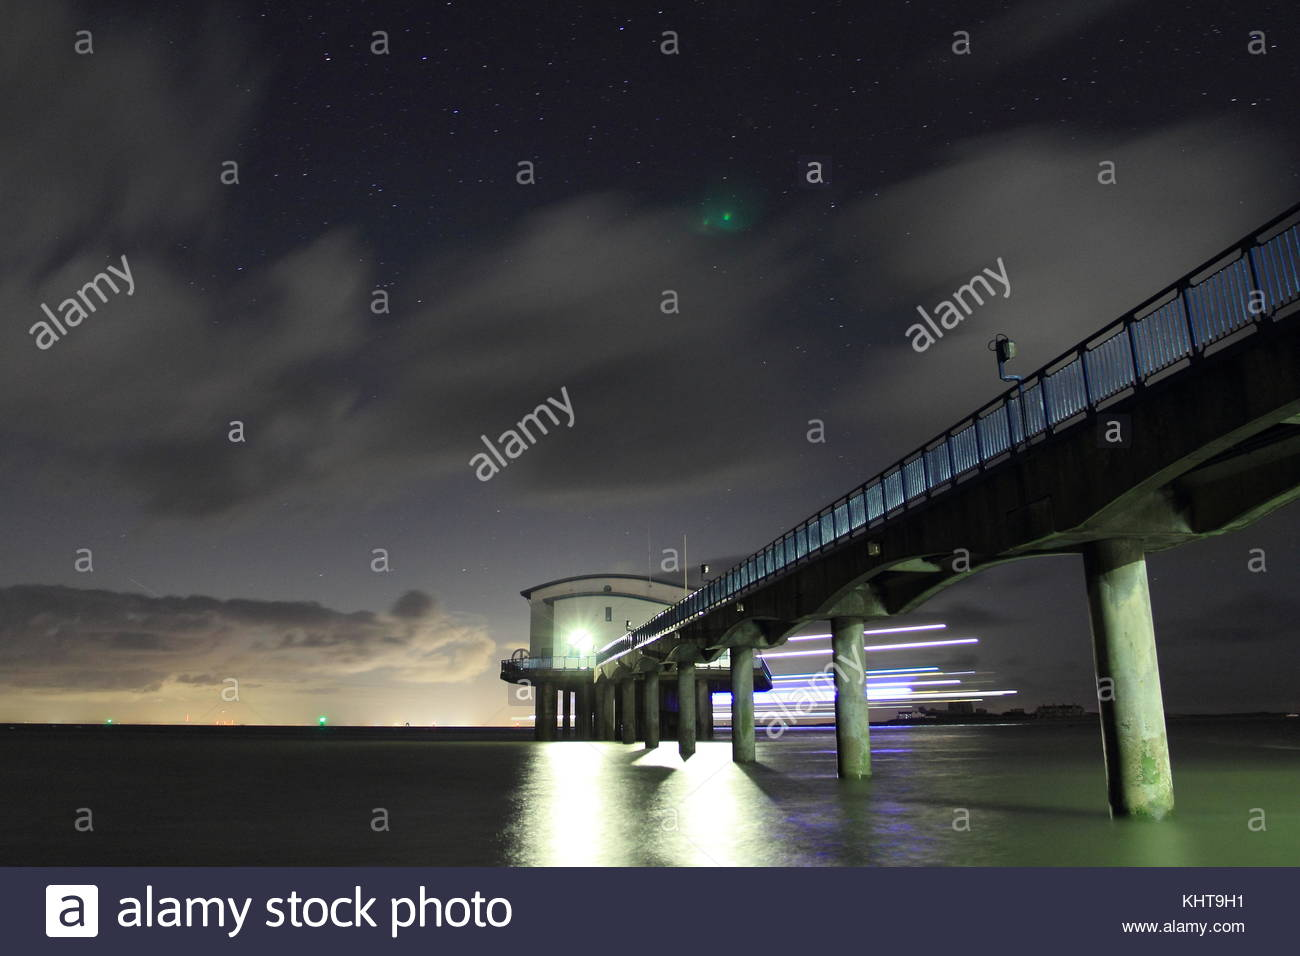 roa-island-lifeboat-station-at-night-tak